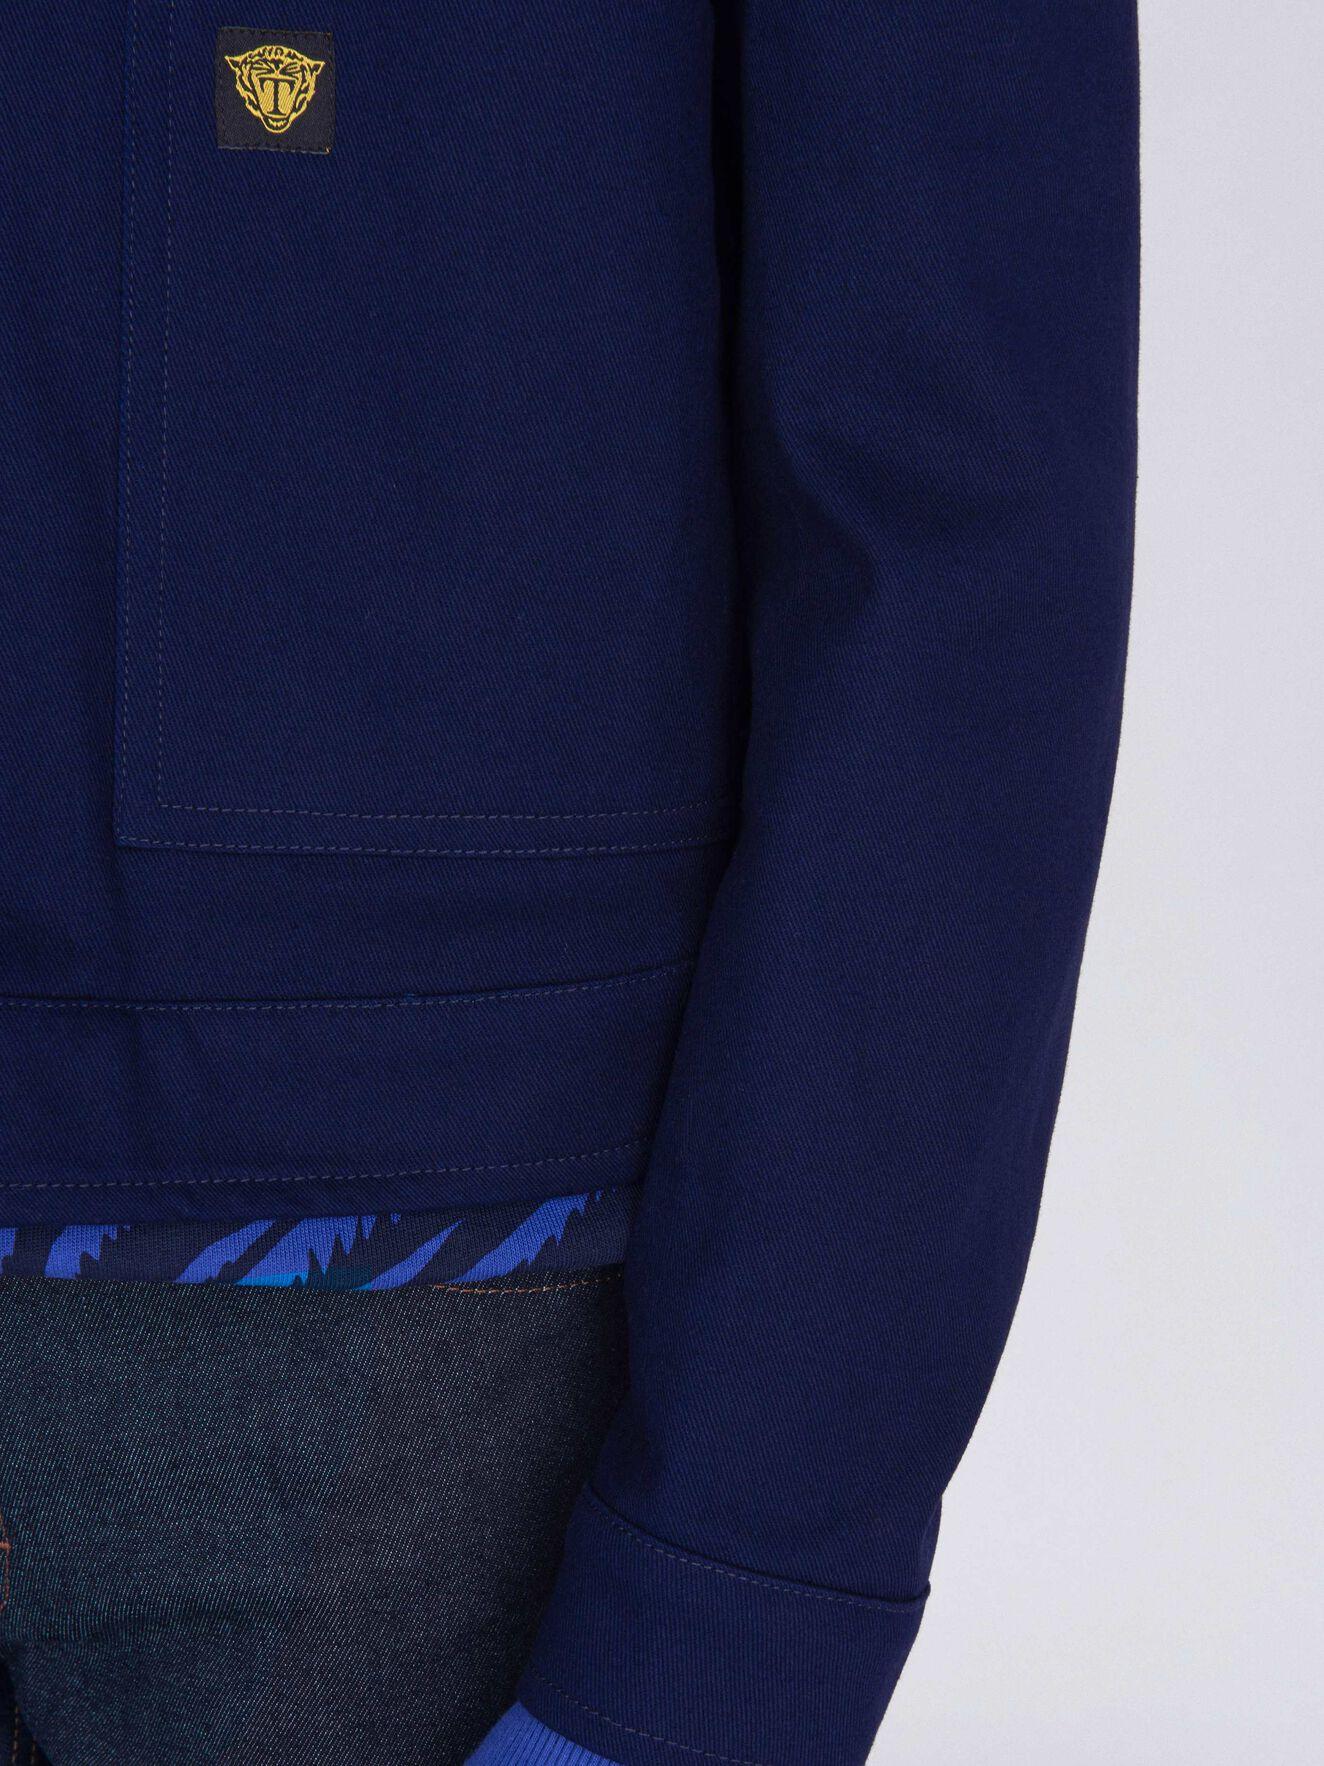 Kasar Jacket in Maritime Blue from Tiger of Sweden